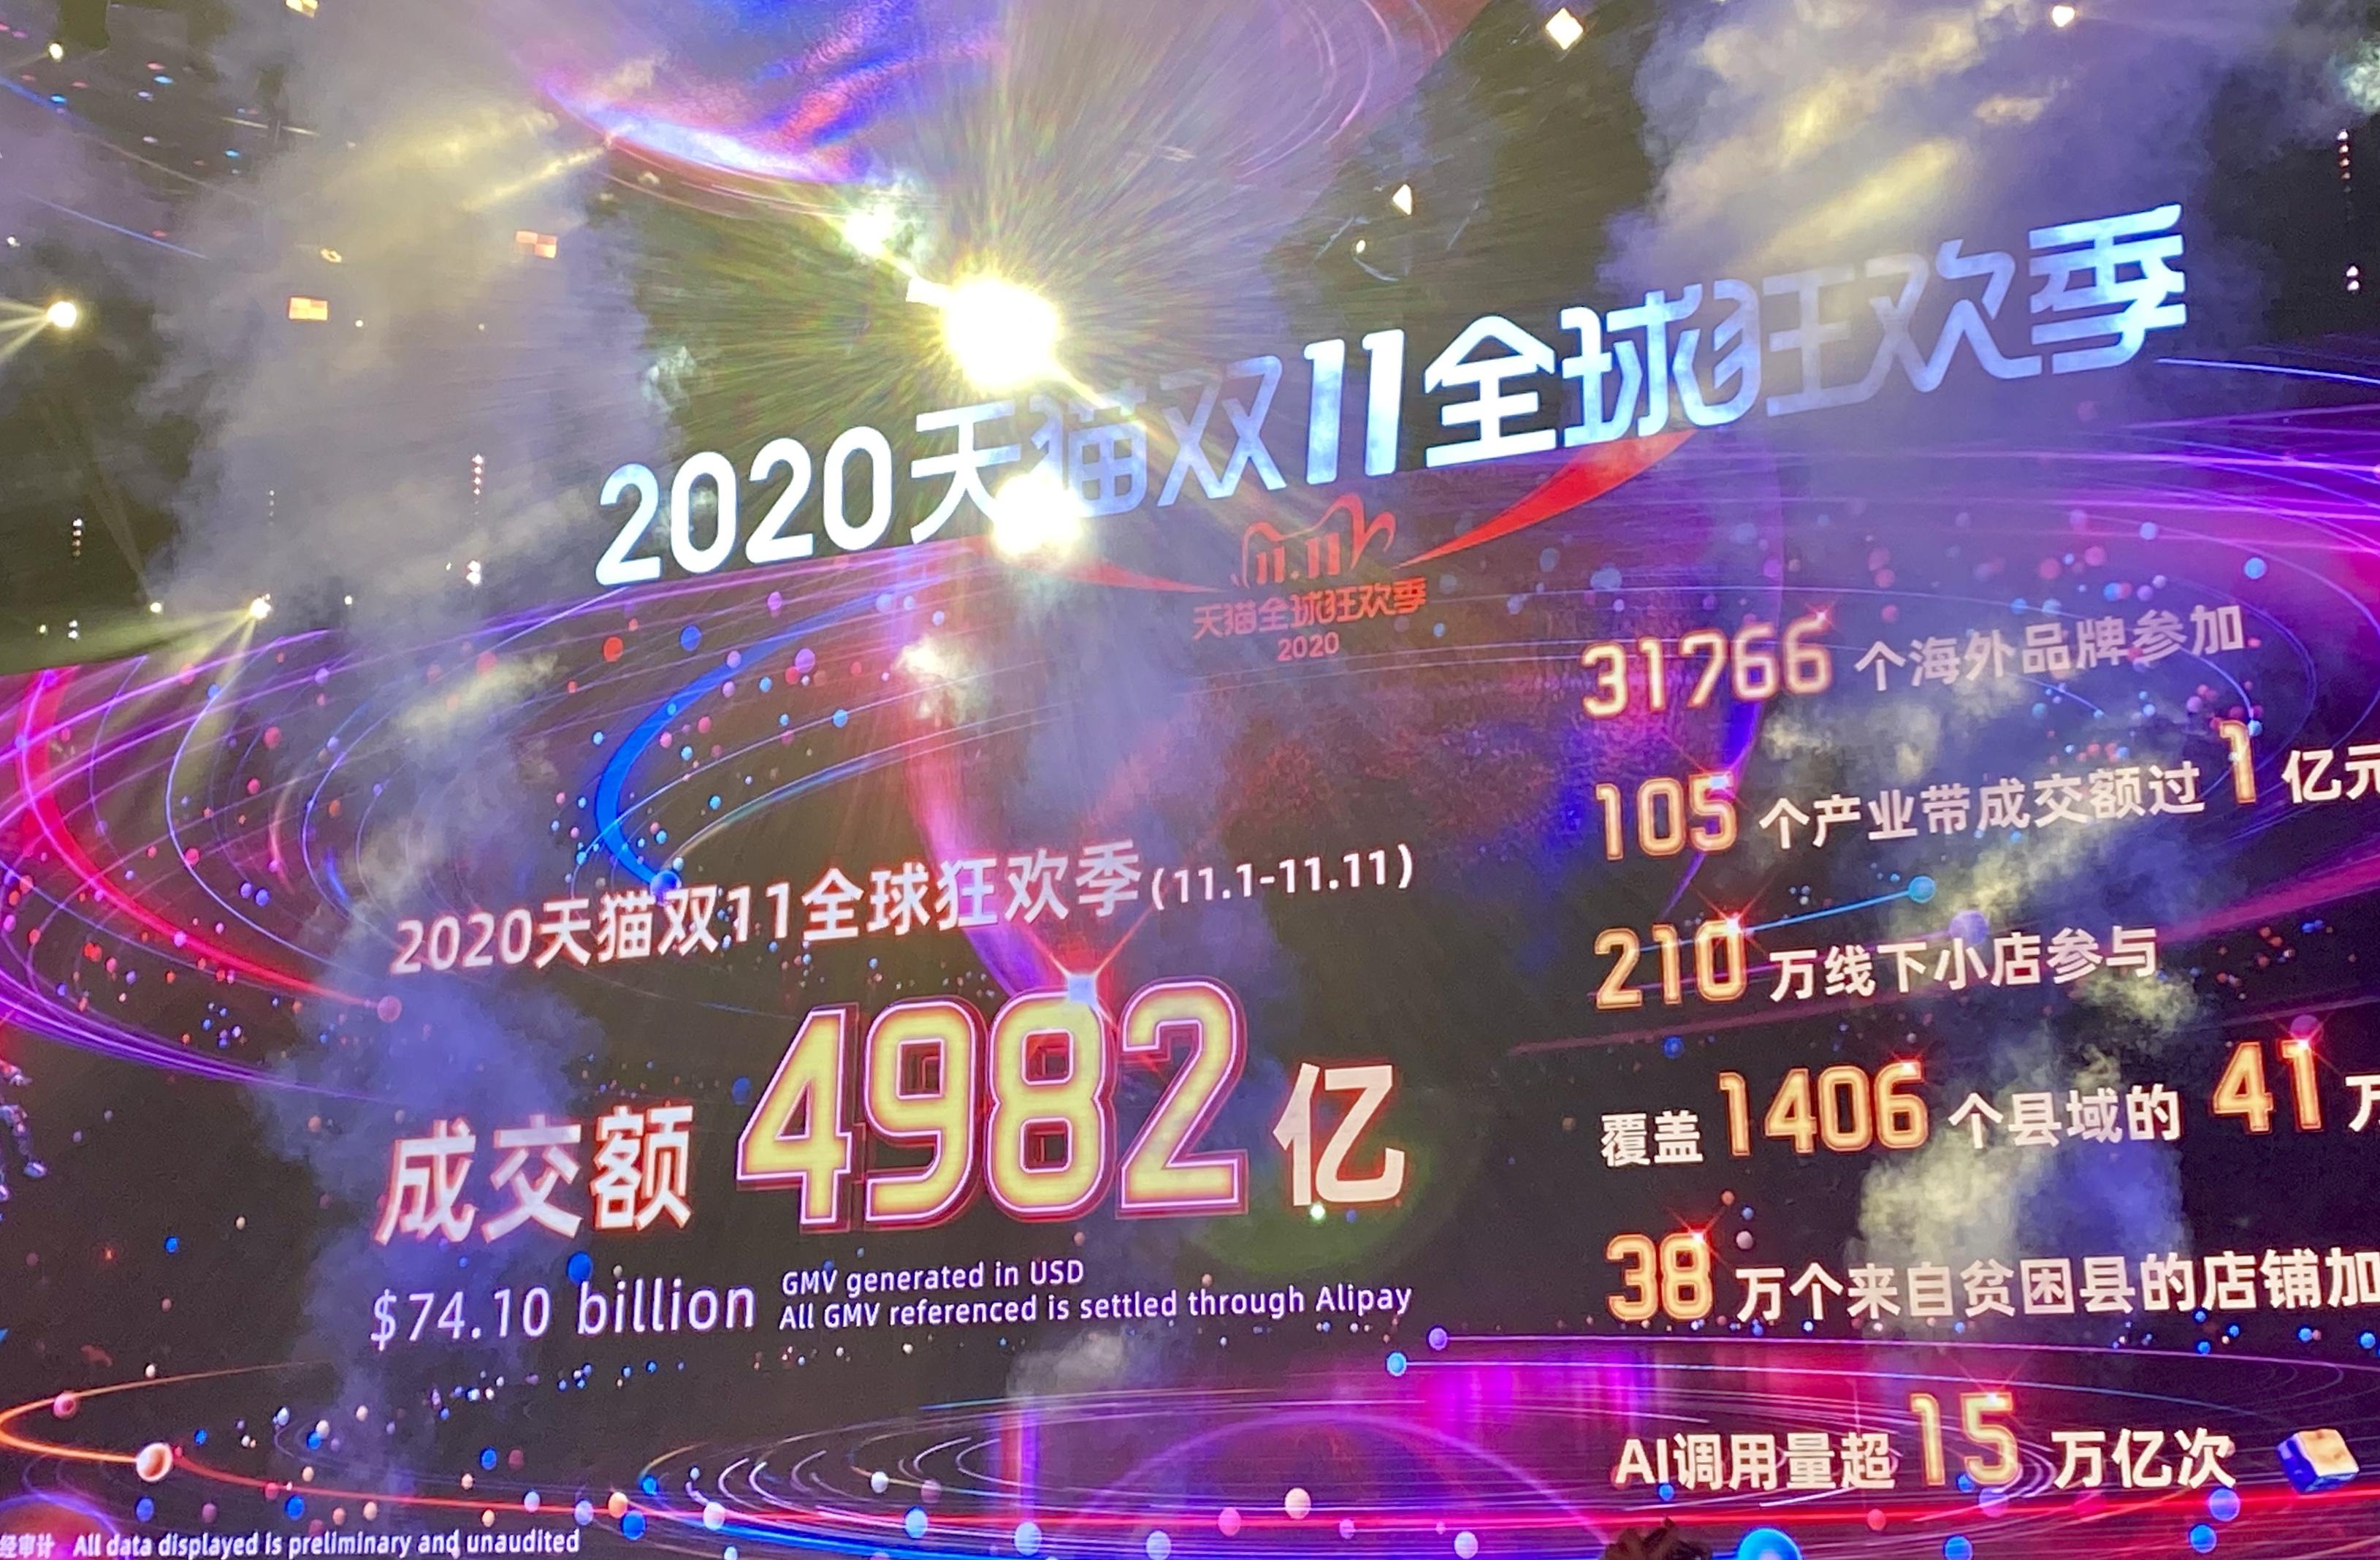 Alibaba's 2020 final tally.